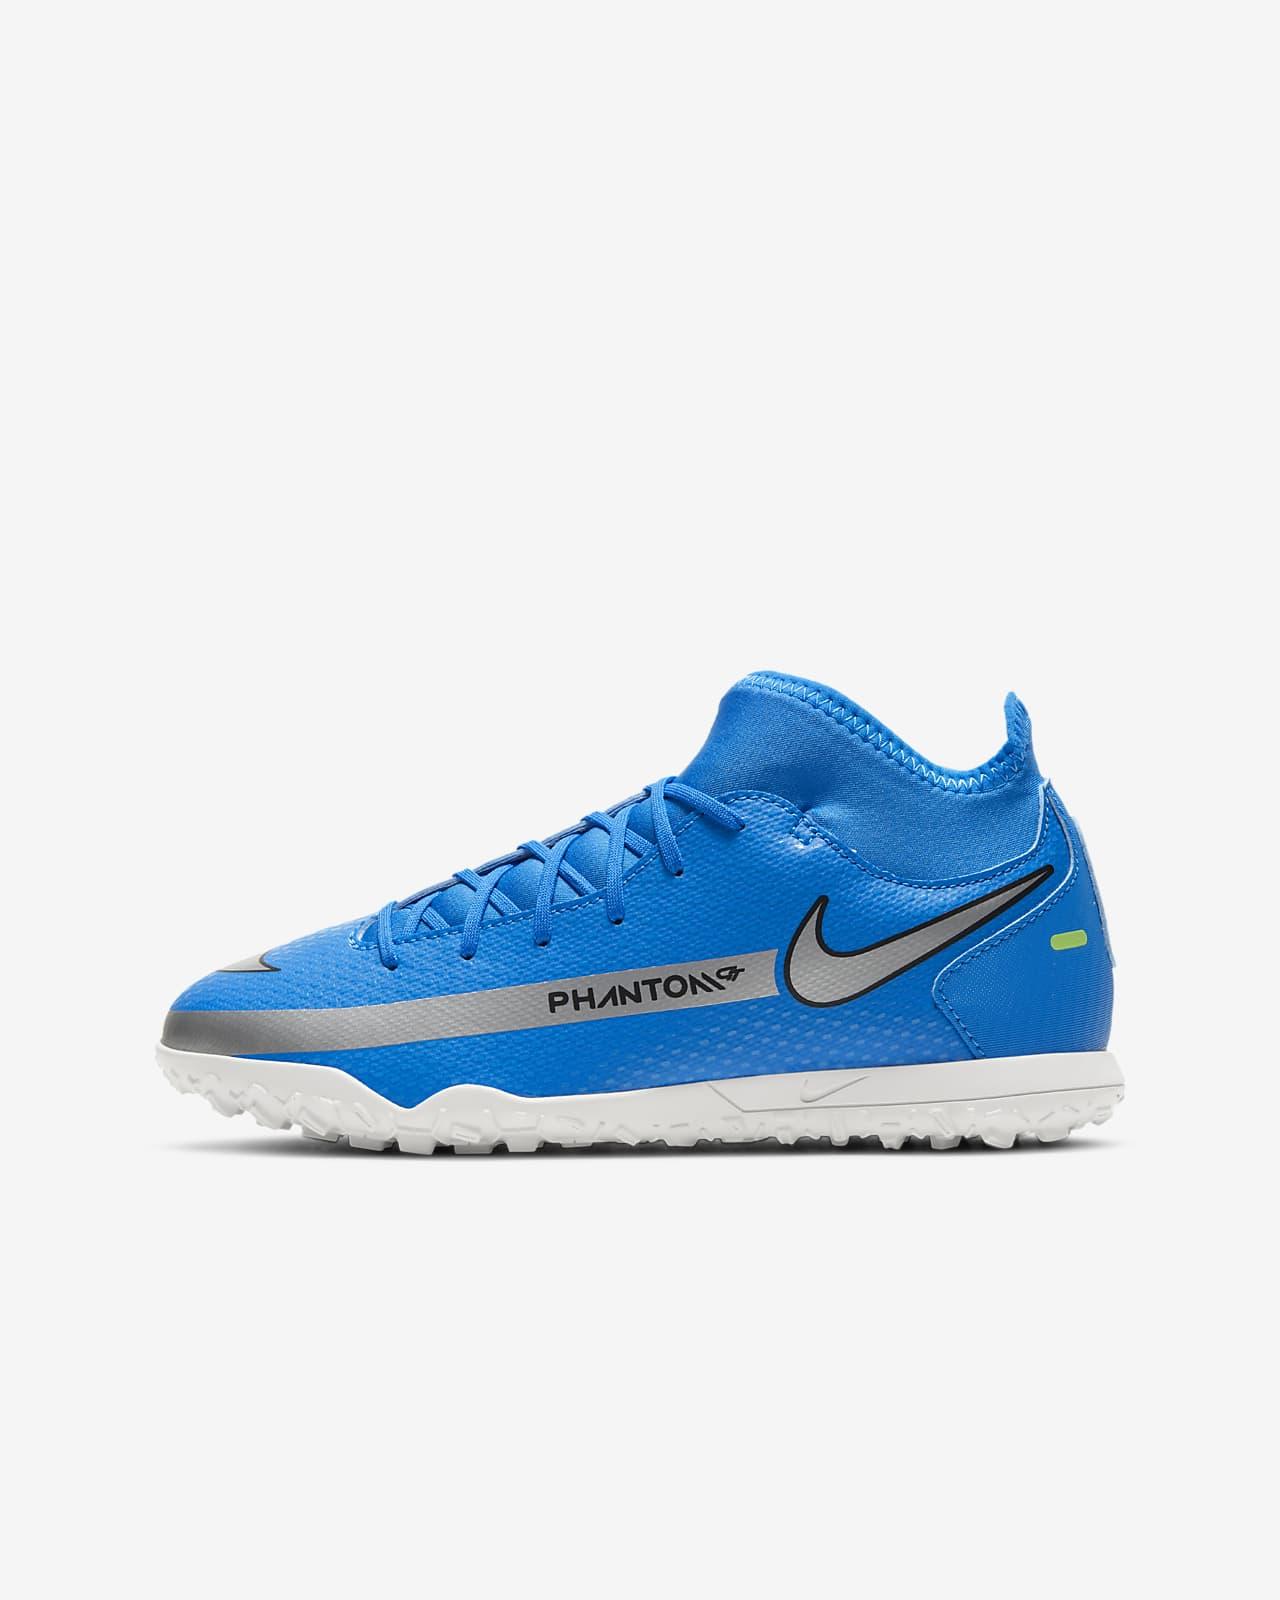 Nike Jr. Phantom GT Club Dynamic Fit TF Little/Big Kids' Artificial-Turf Soccer Shoe